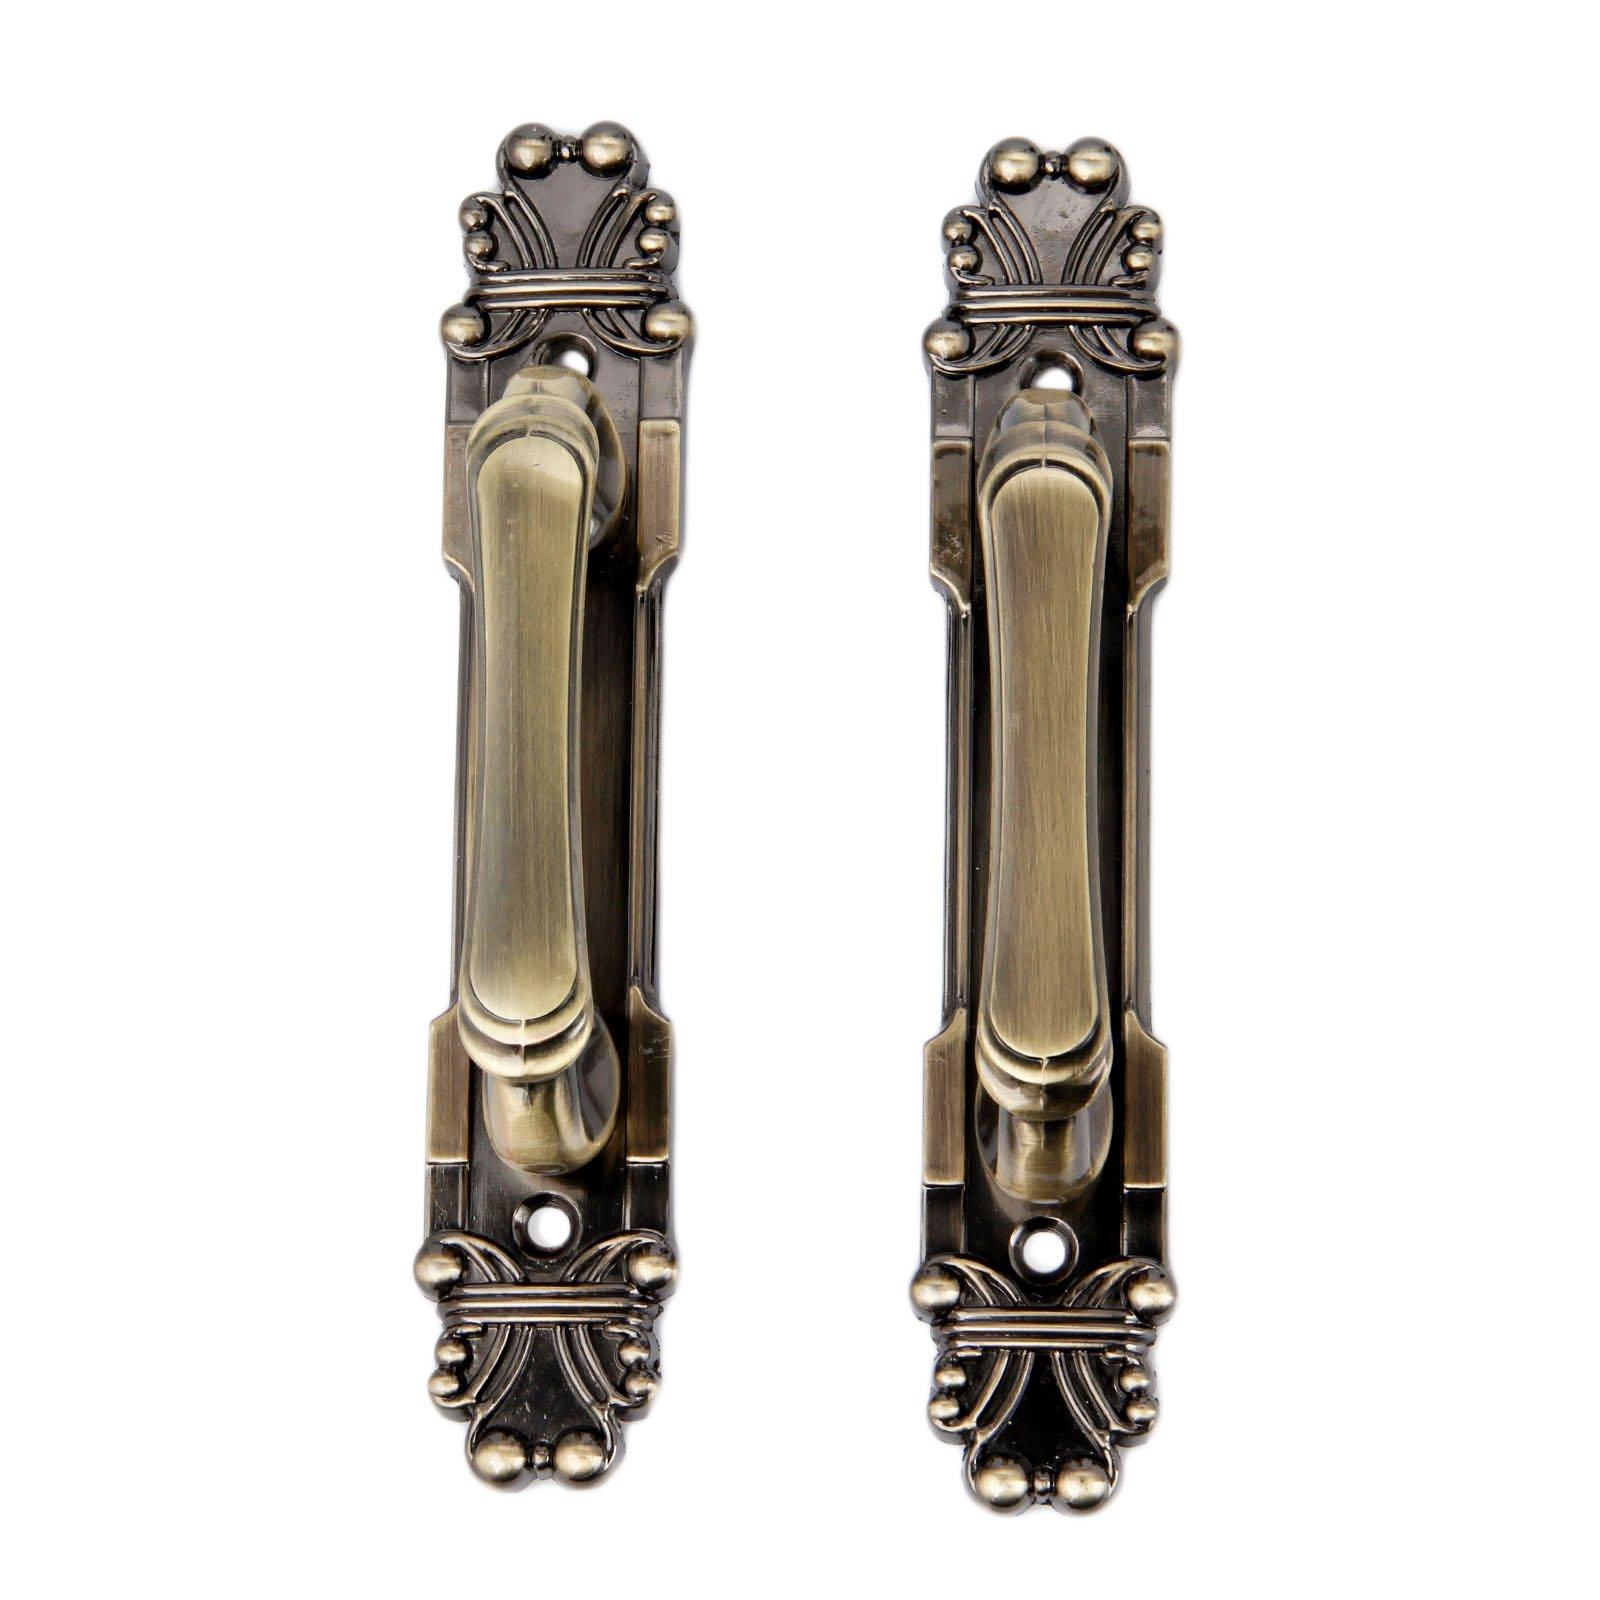 10Pcs 165mm European Style Vintage Brass Metal Knobs Handles For Home Cabinet Door Drawer Wardrobe Cupboard Antique Bronze